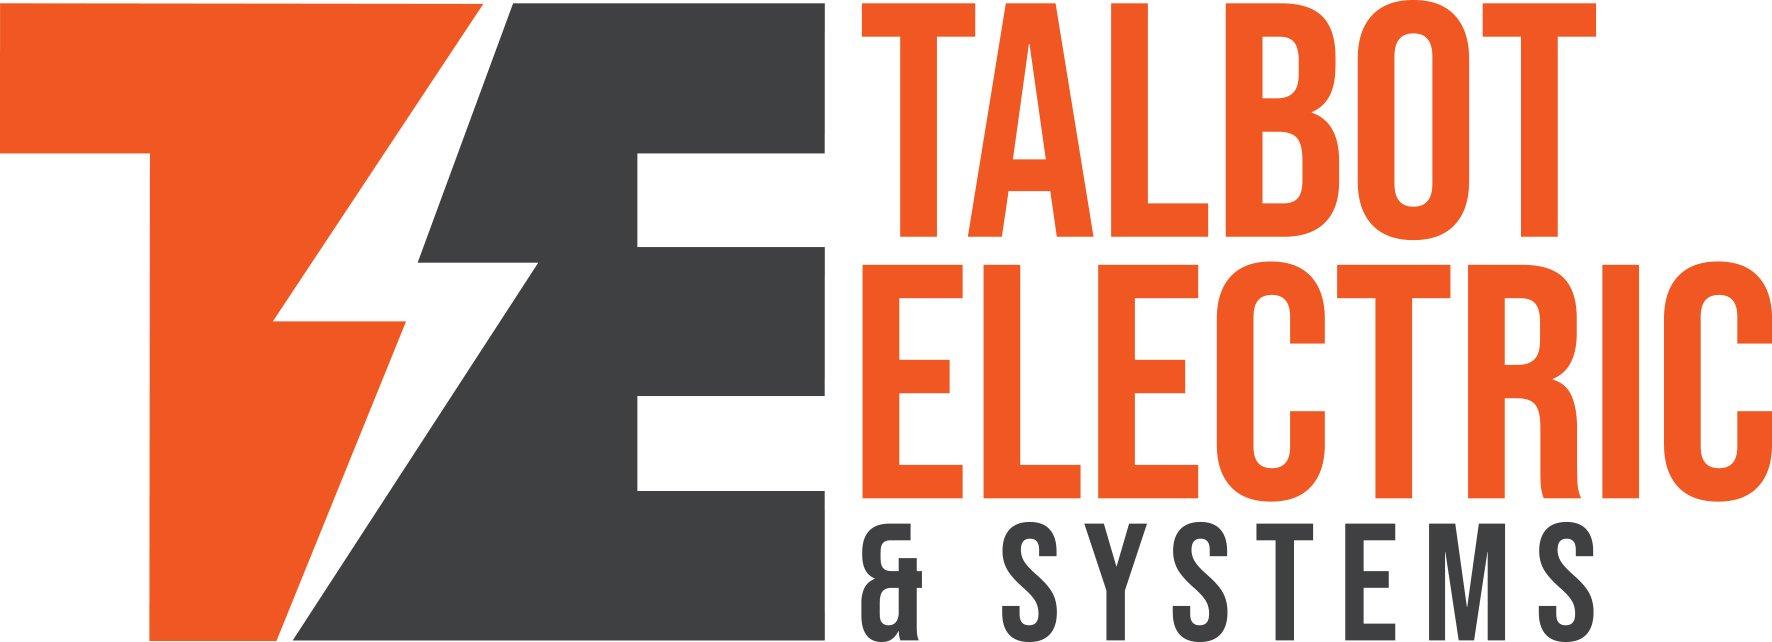 Talbot Electric